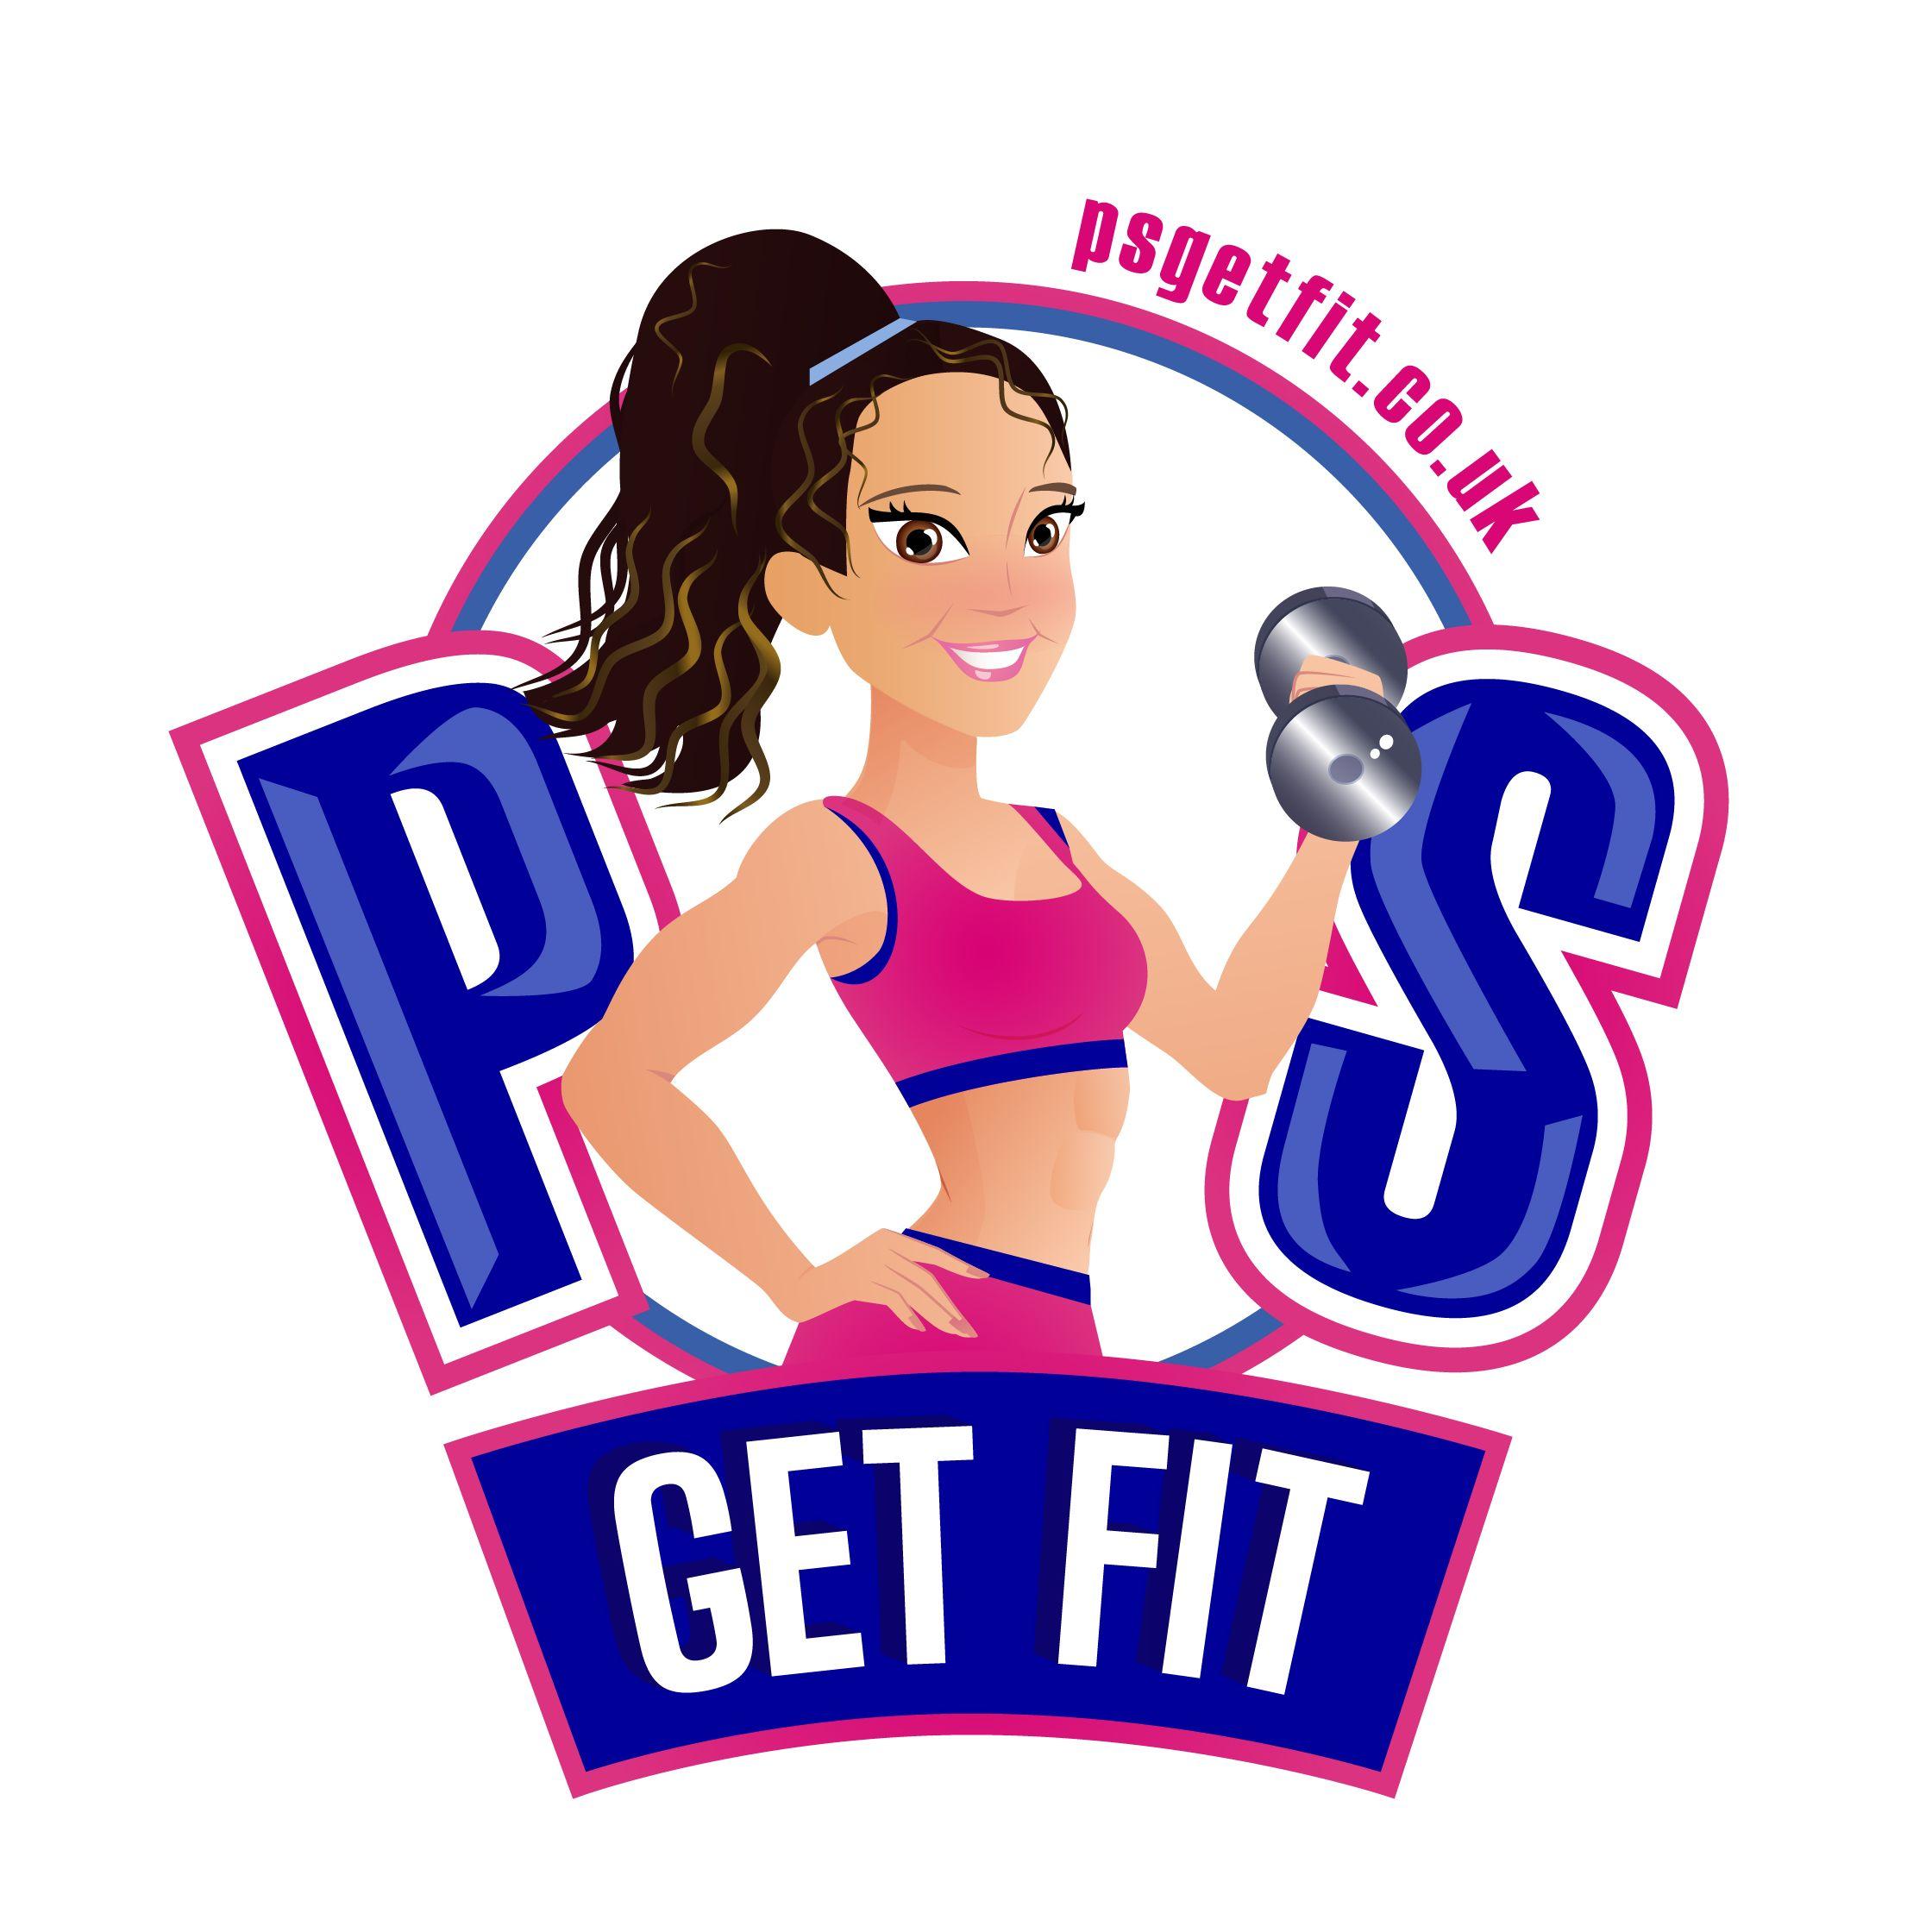 P.S. Get Fit